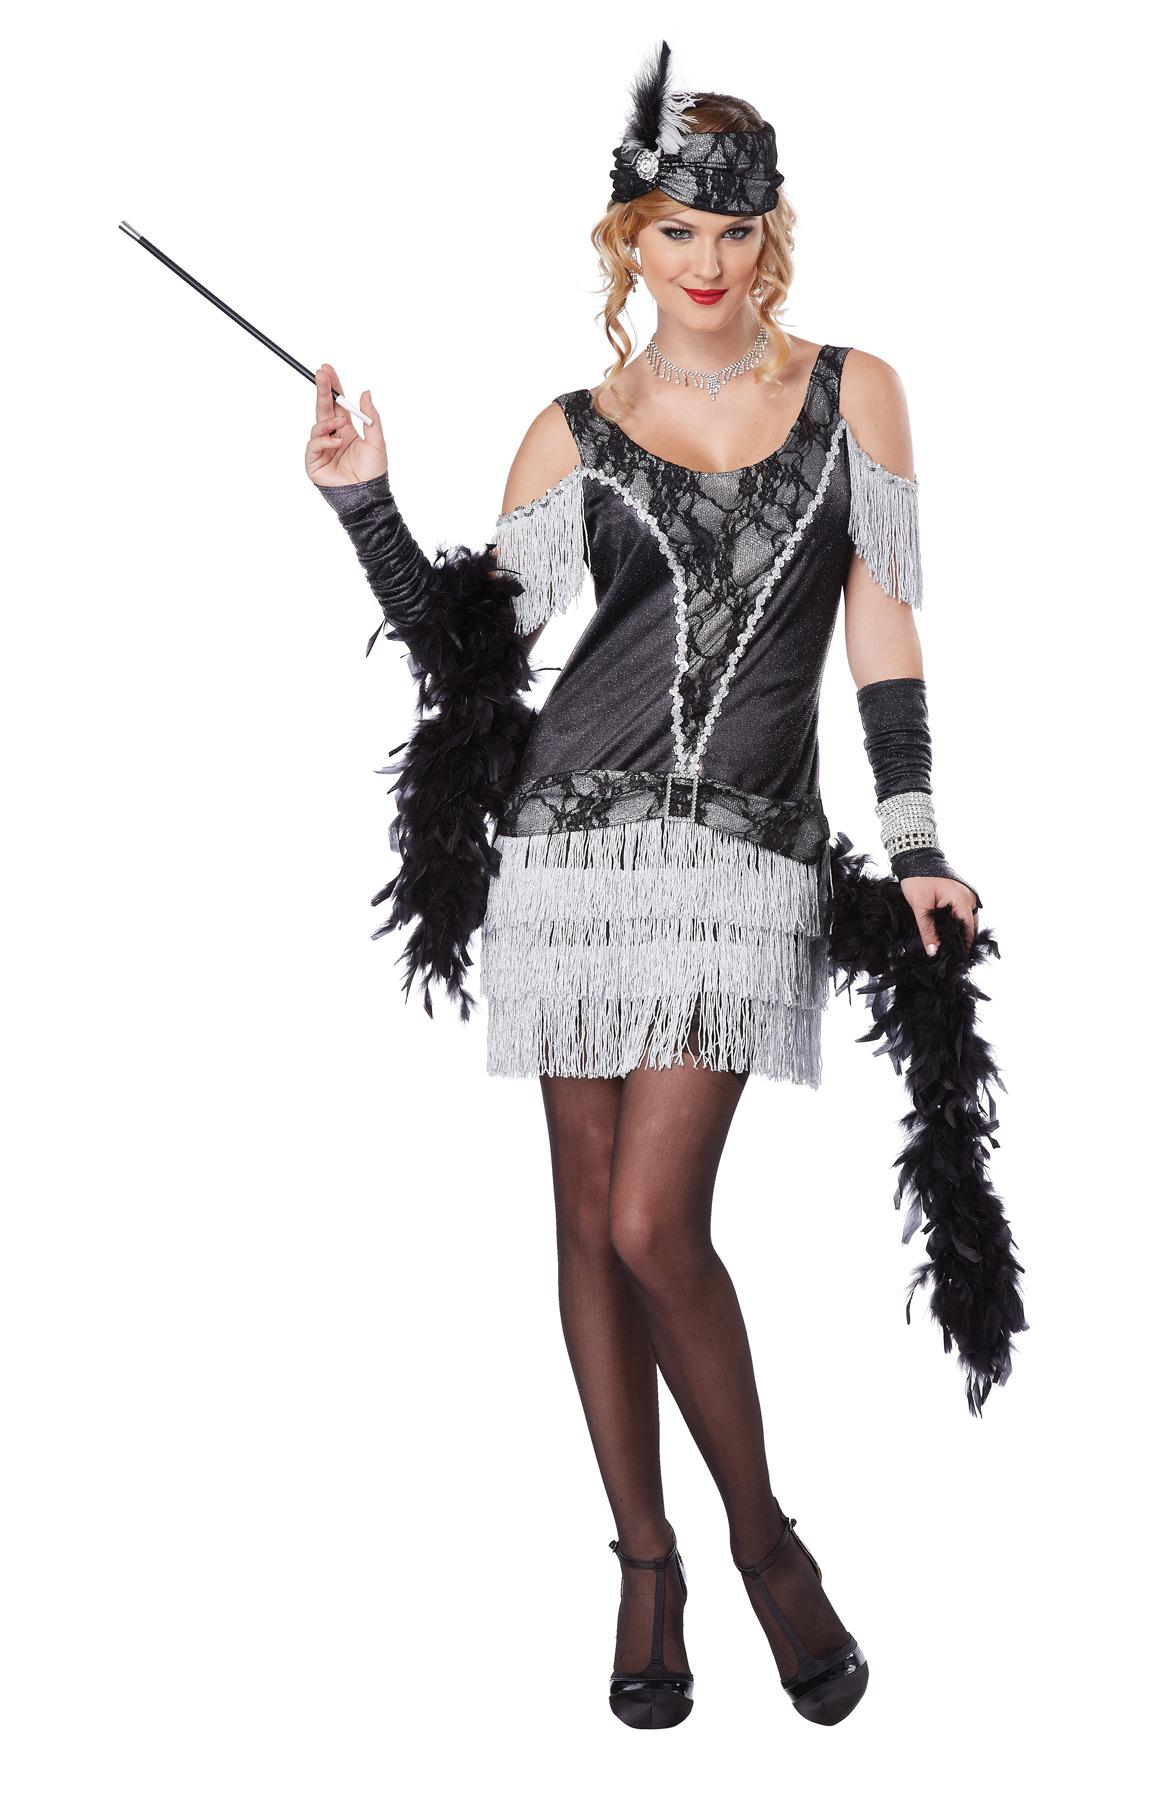 razzle dazzle adult costume | house of aberrant